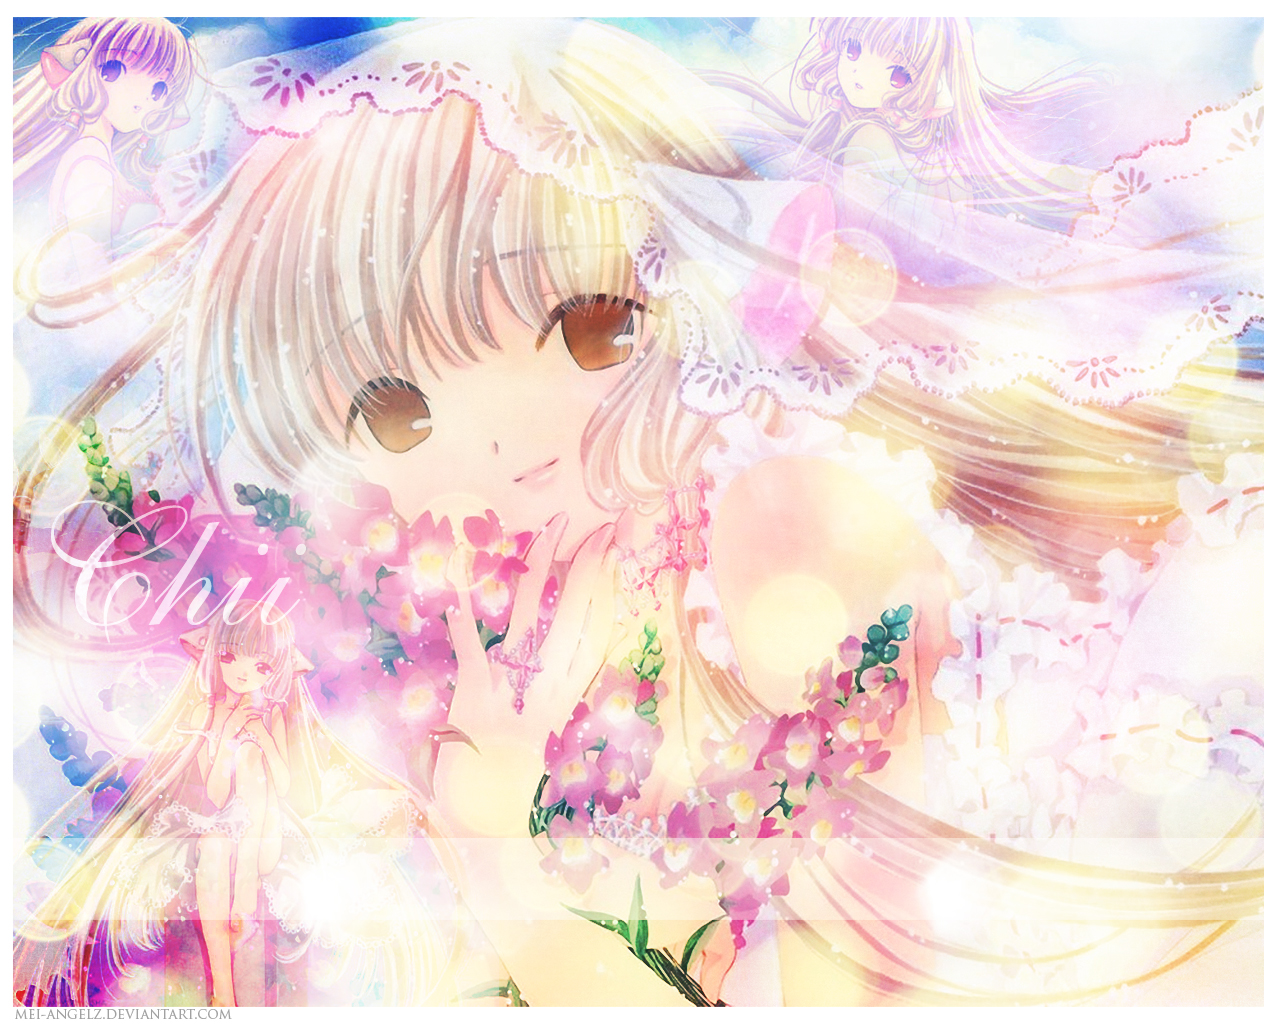 Chobits Chii 4 Cool Hd Wallpaper Animewpcom